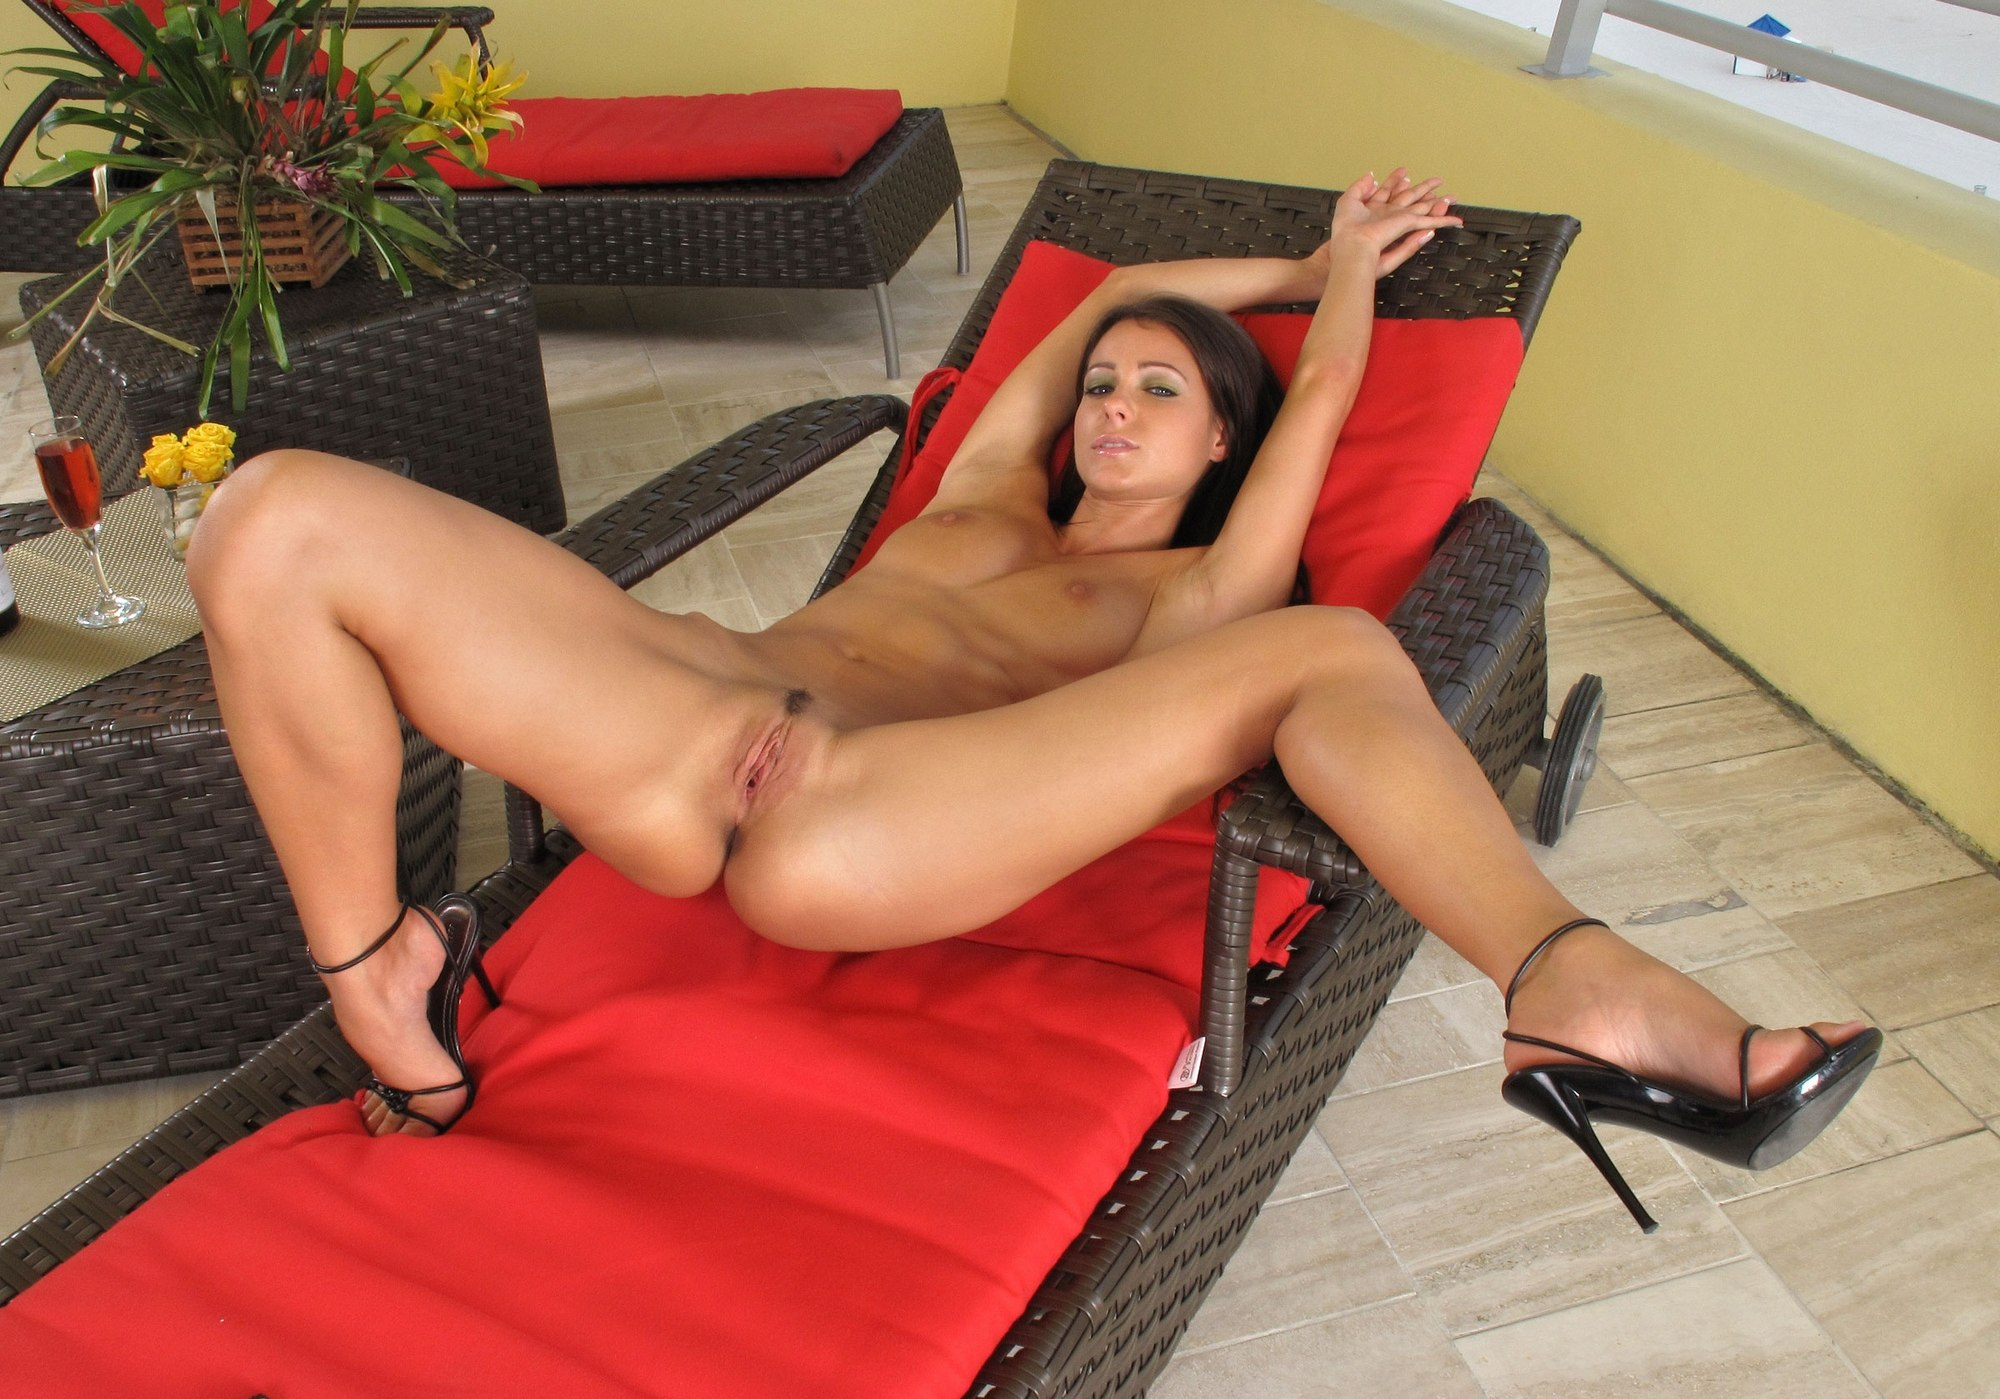 Arwin's Live Training Session Woman Following Orders Erotic Magic